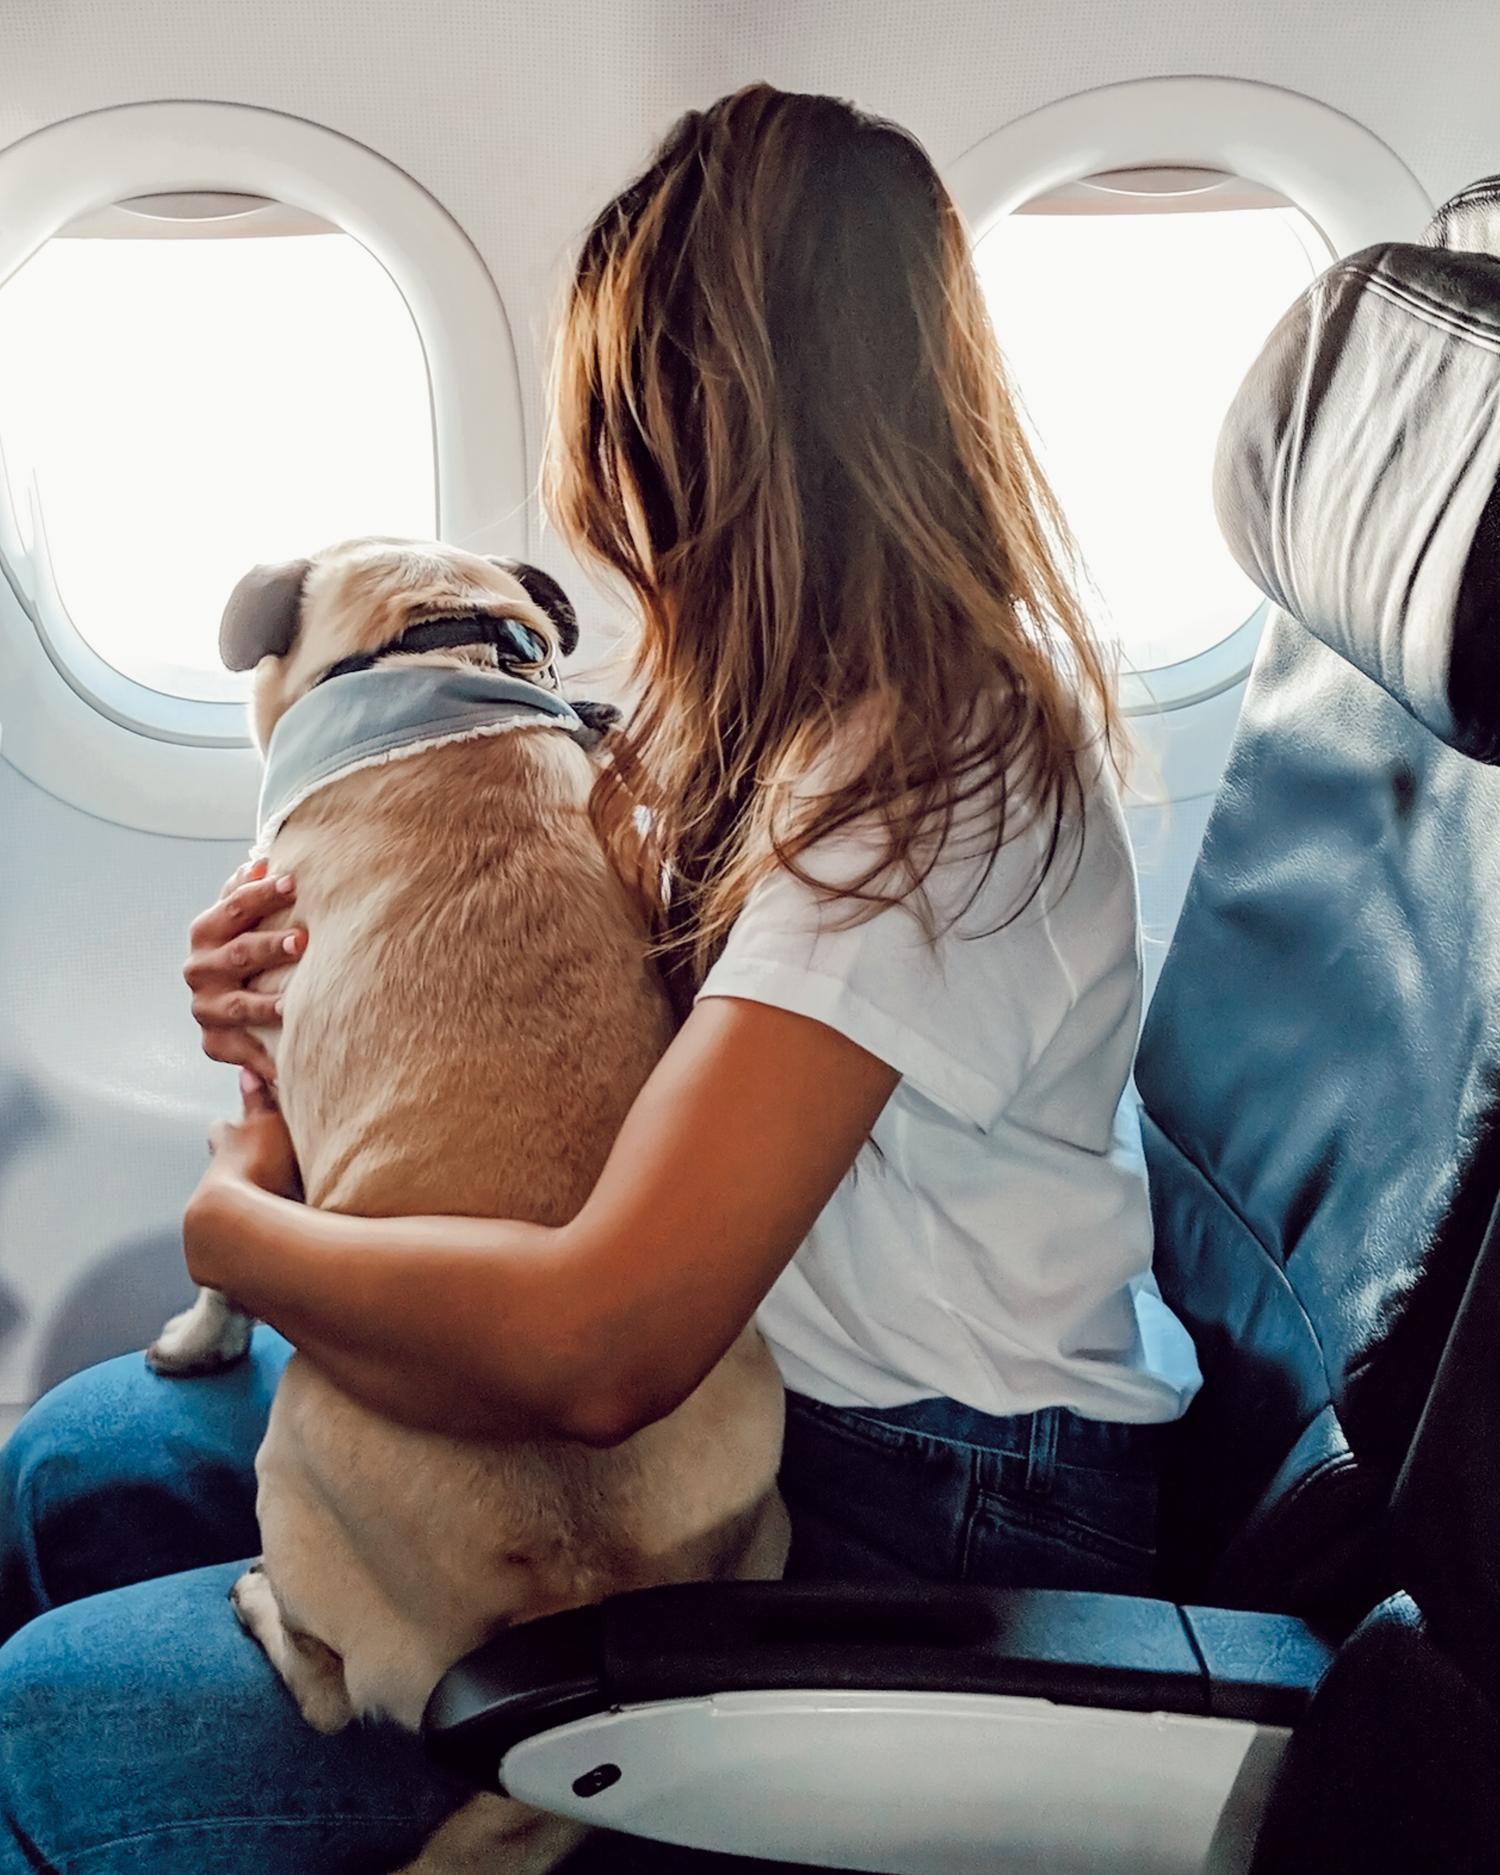 international-travel-with-dog-paris-uk-from-us-dogfriendly-travel 4.JPG